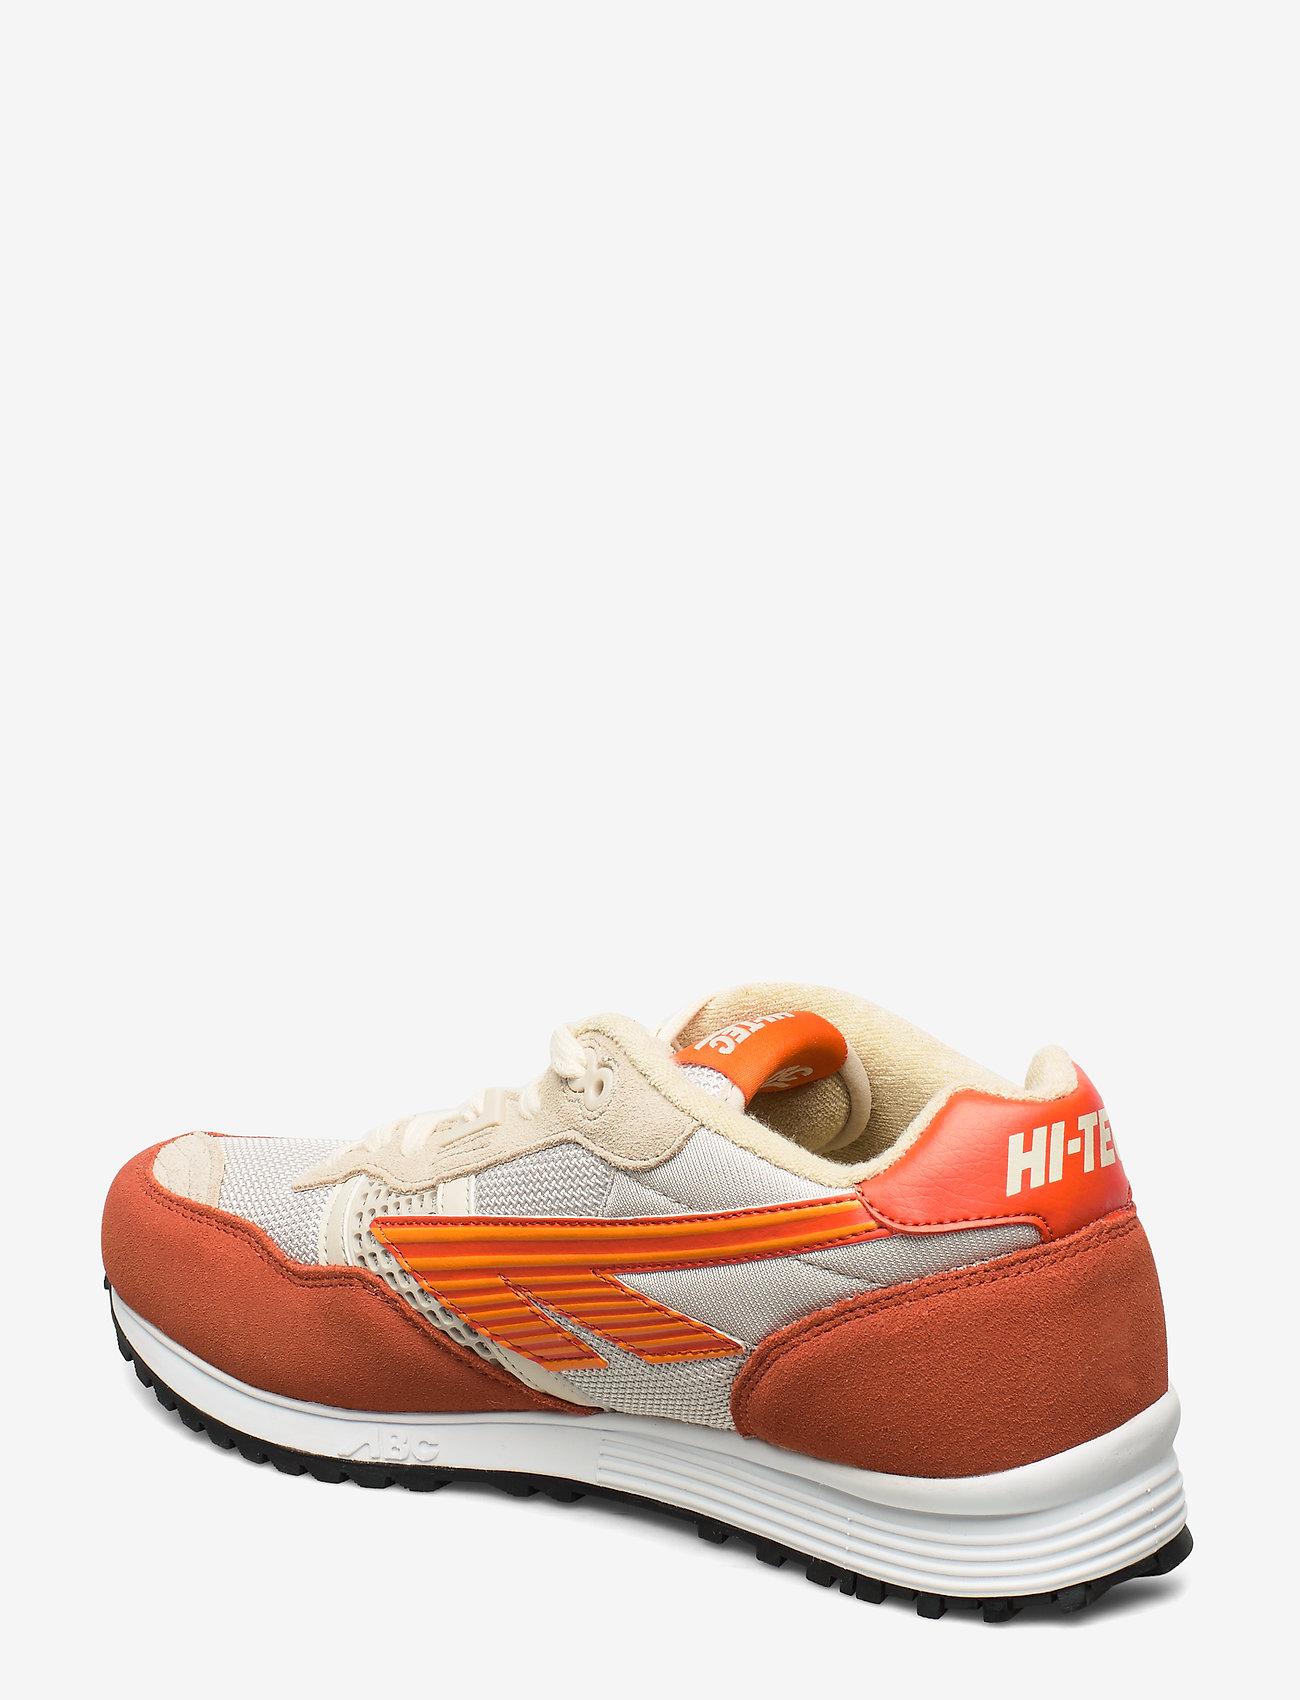 Ht Bw 146 Ochre/birch/mandarin Red/flame Orange (Ochre/birch/red/orng) (66 €) - Hi-Tec 8yeMl